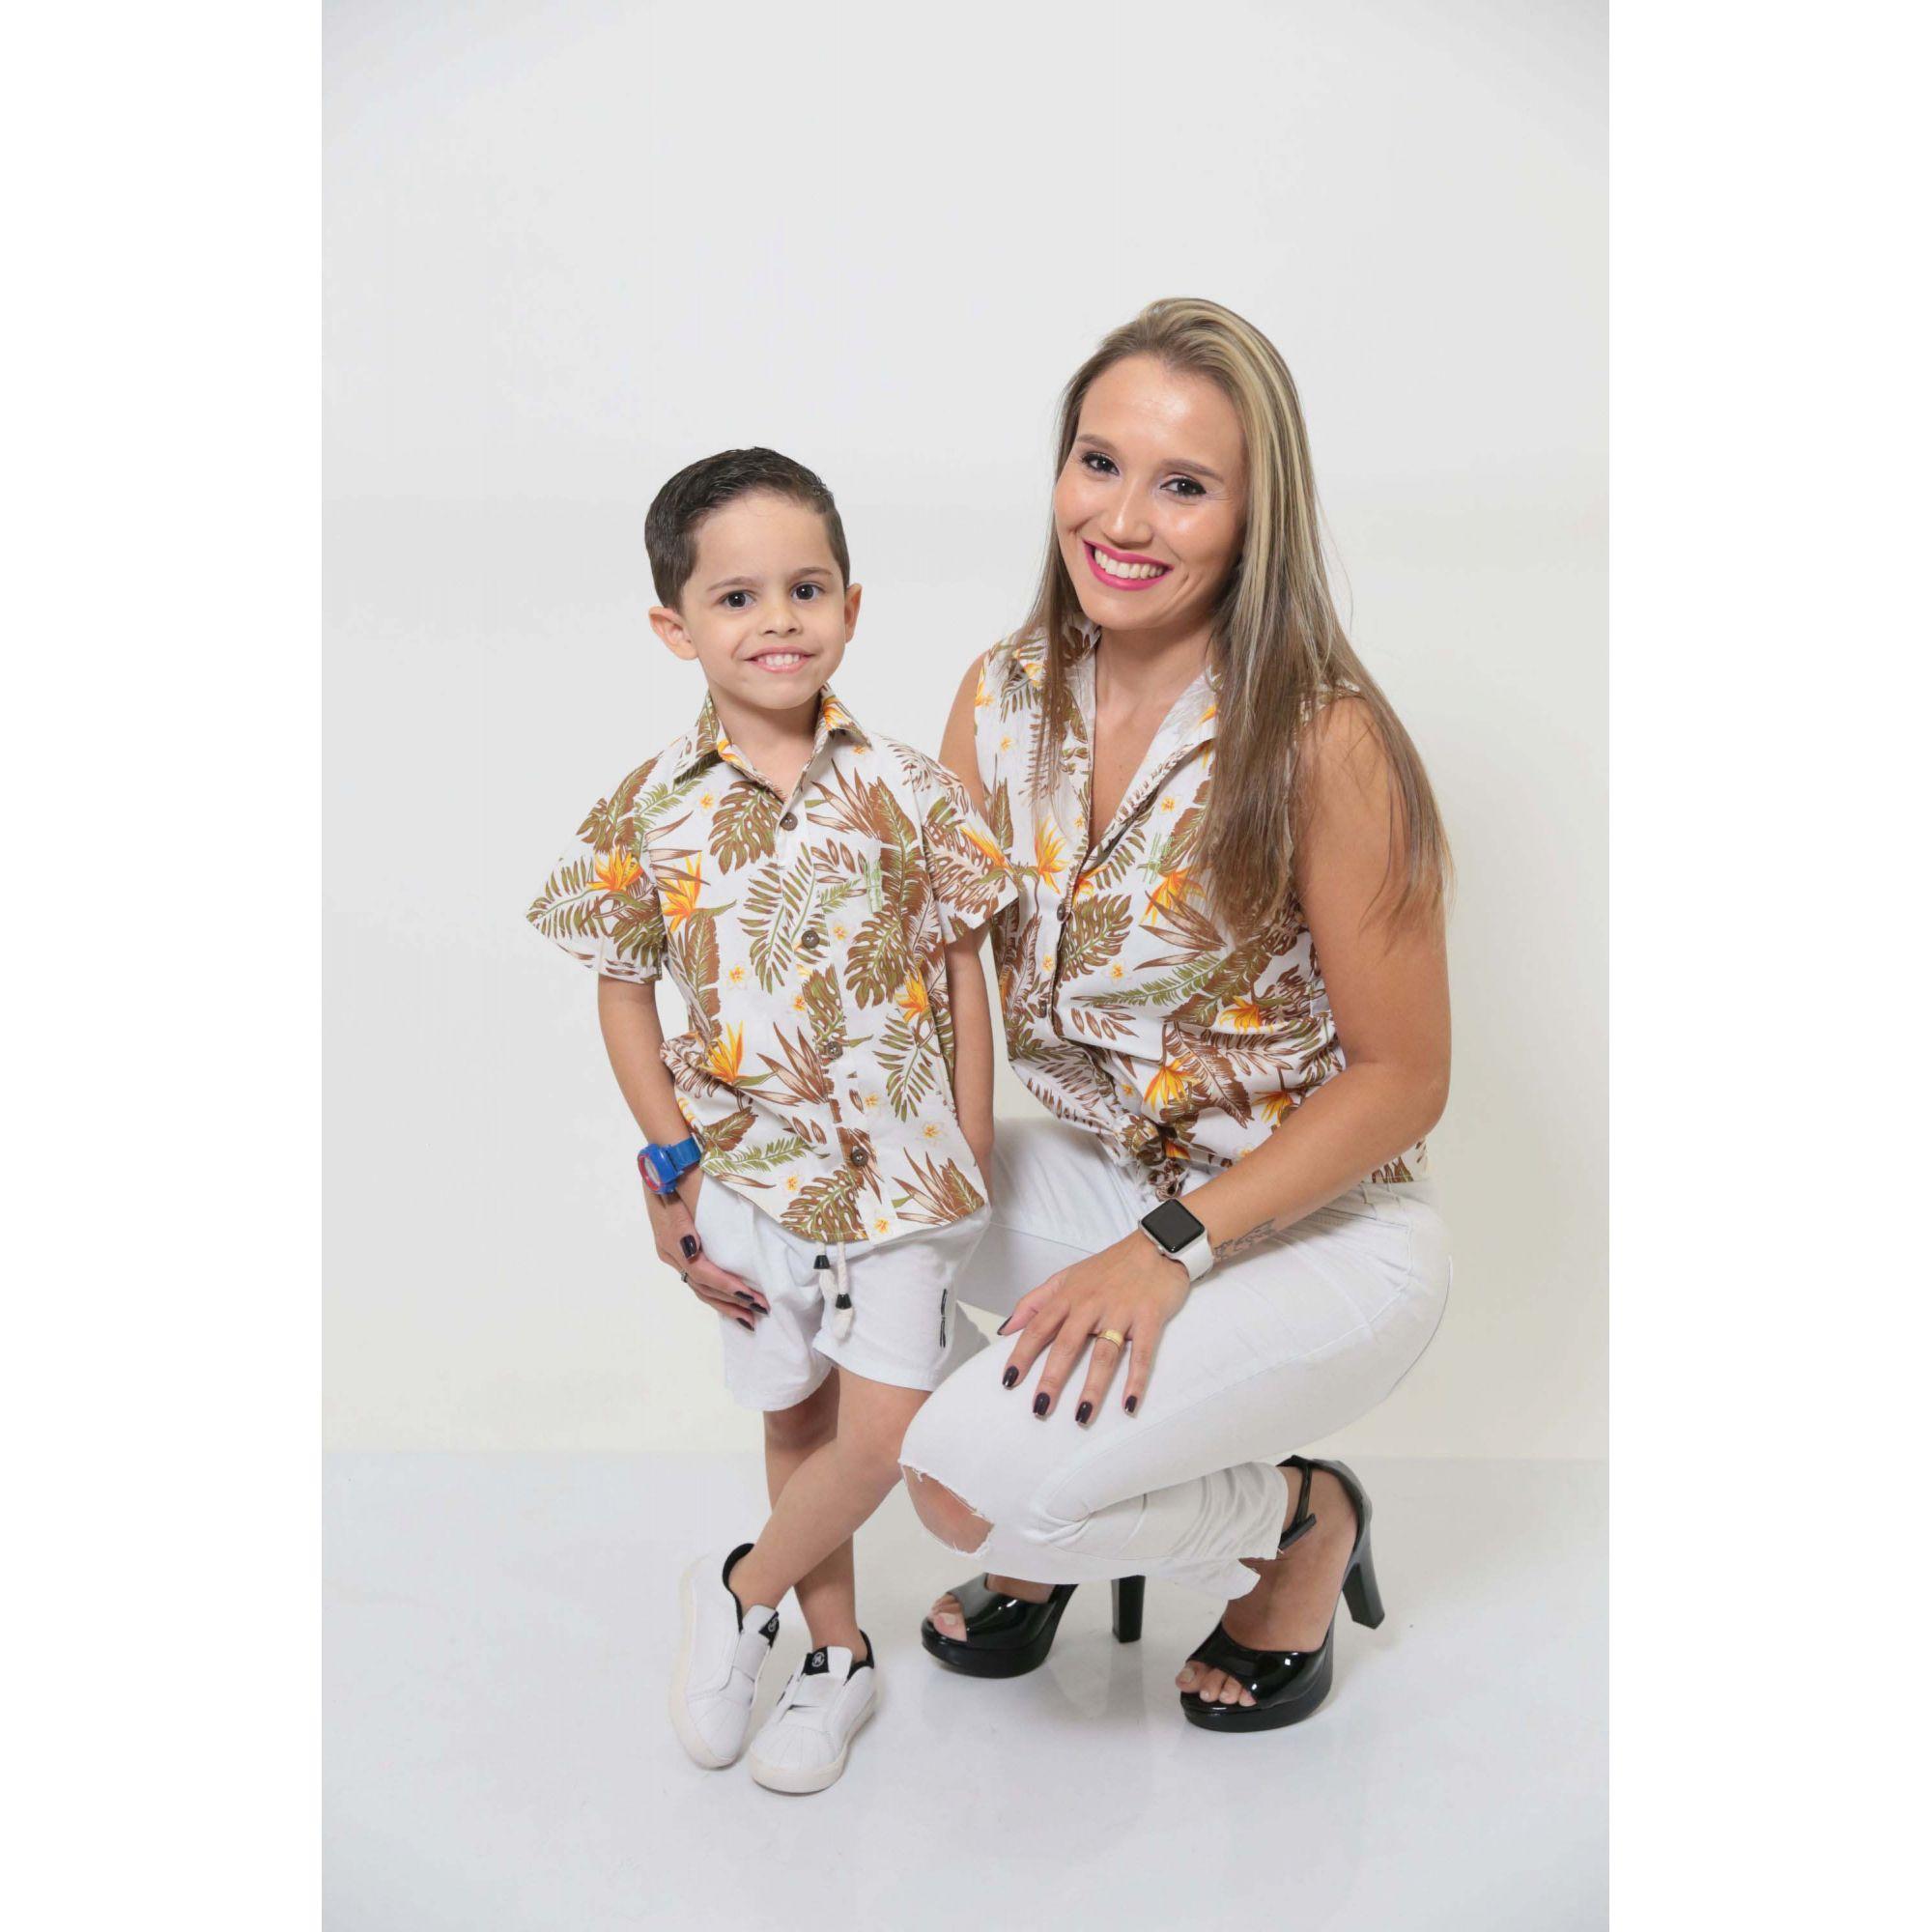 MÃE E FILHO > Kit 02 Camisas Social - Adulto e Infantil Amazonas [Coleção Tal Mãe Tal Filho]